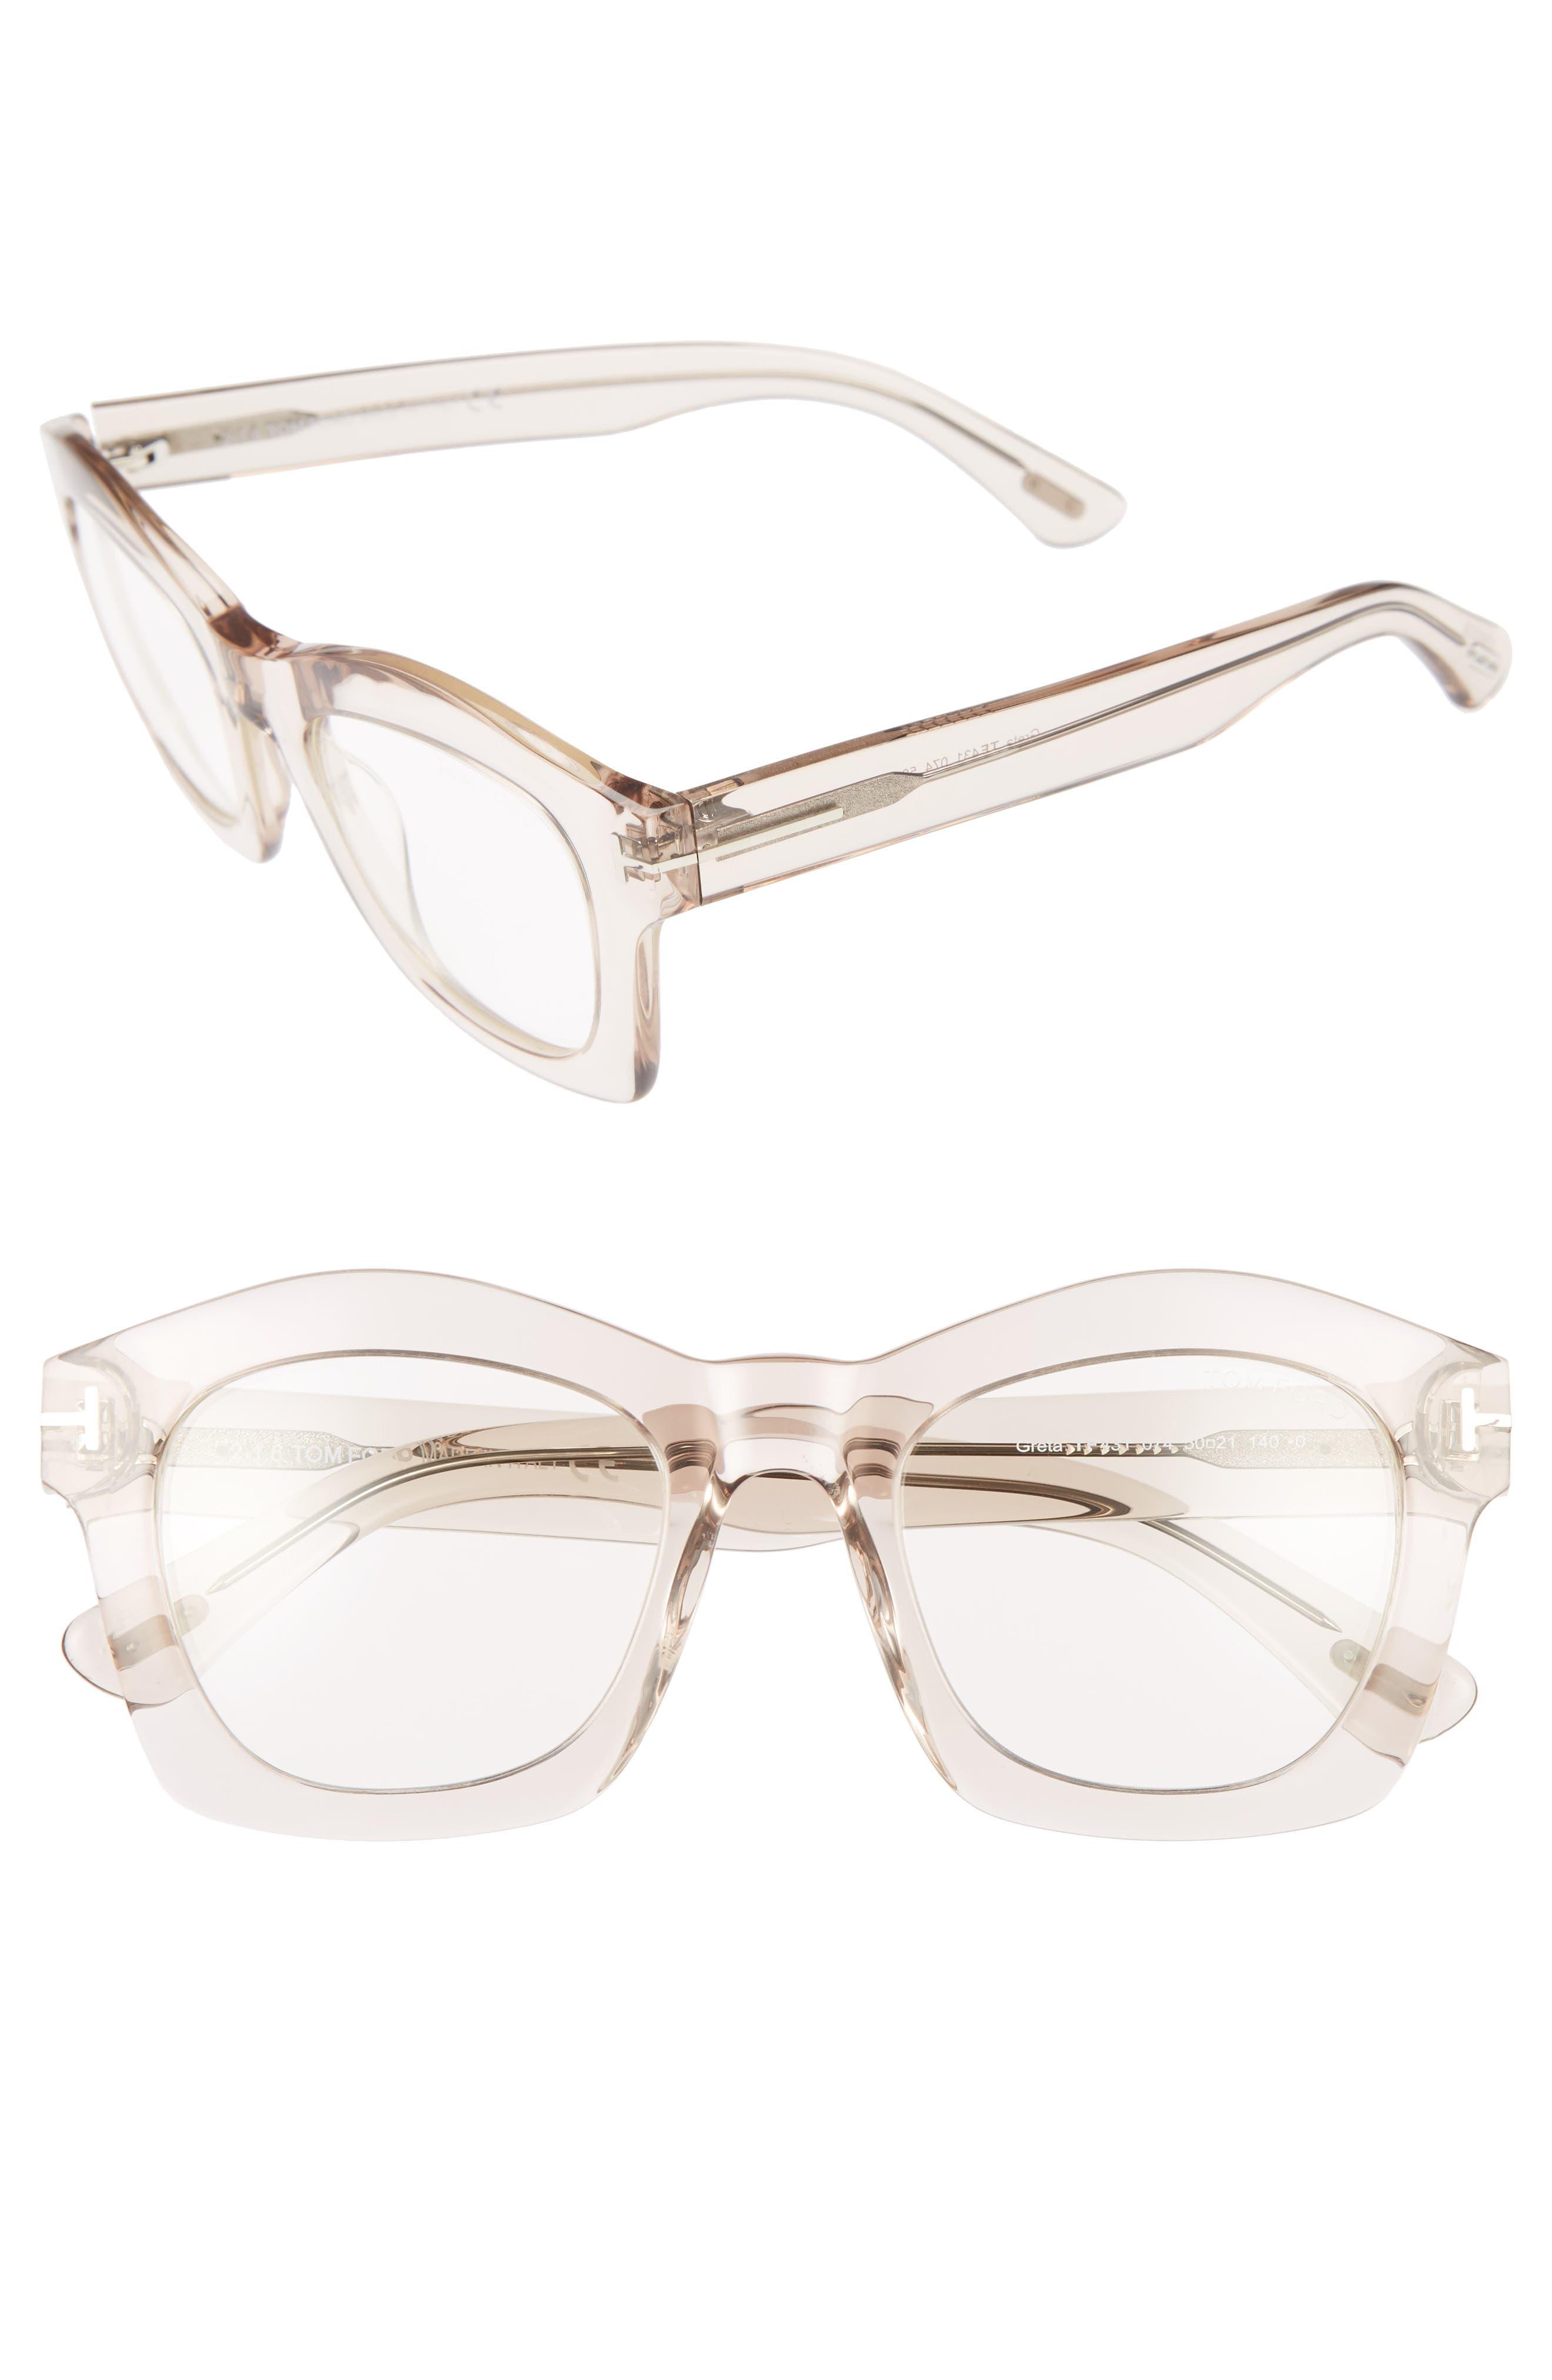 TOM FORD Greta 50mm Sunglasses